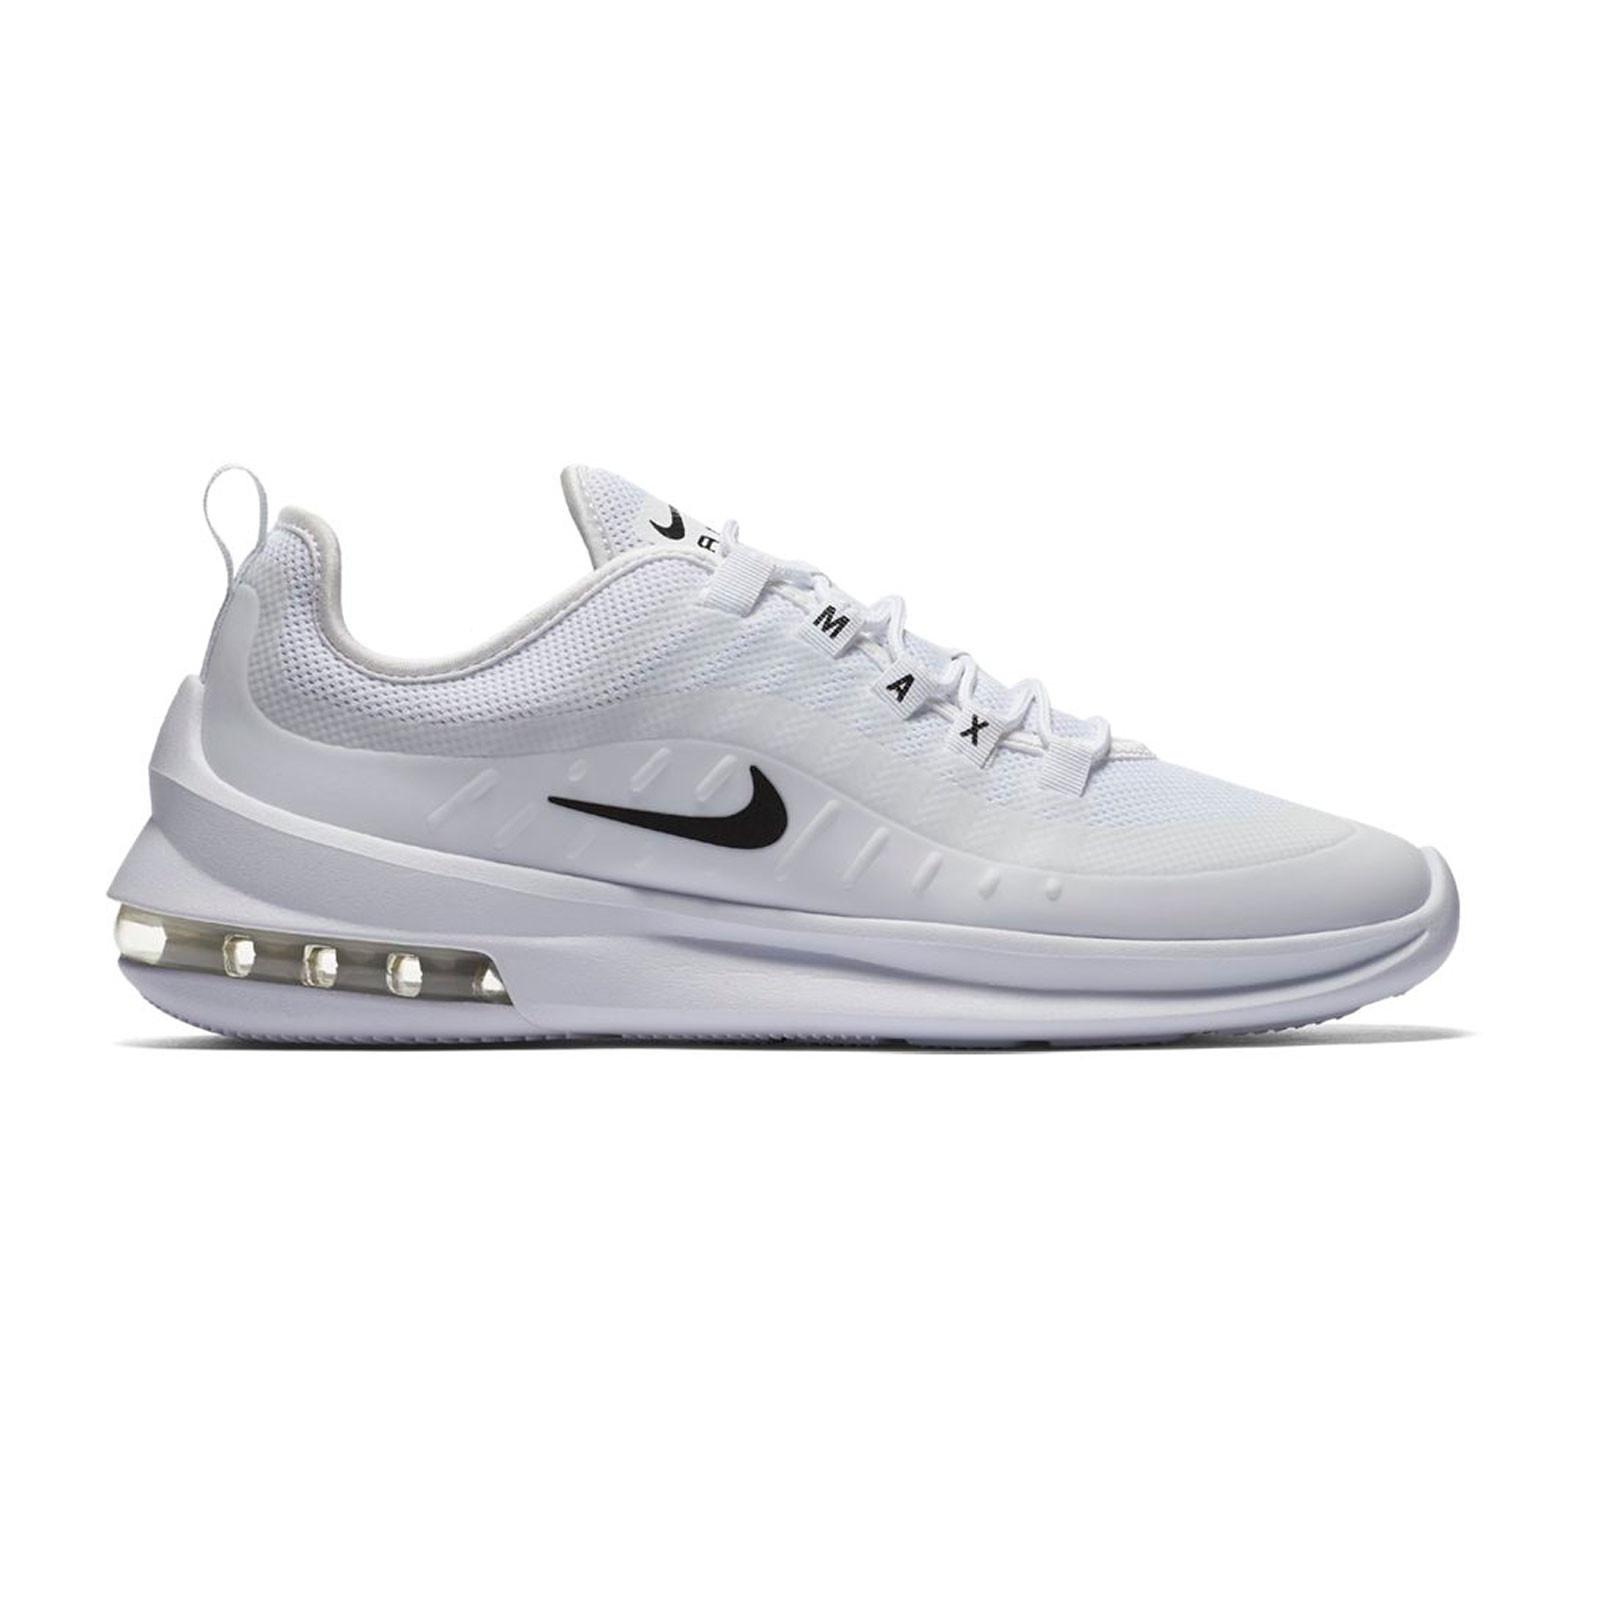 grande Árbol de tochi Mercado  Zapatillas Nike Air Max Axis Sportswear para Hombre   Runa Store